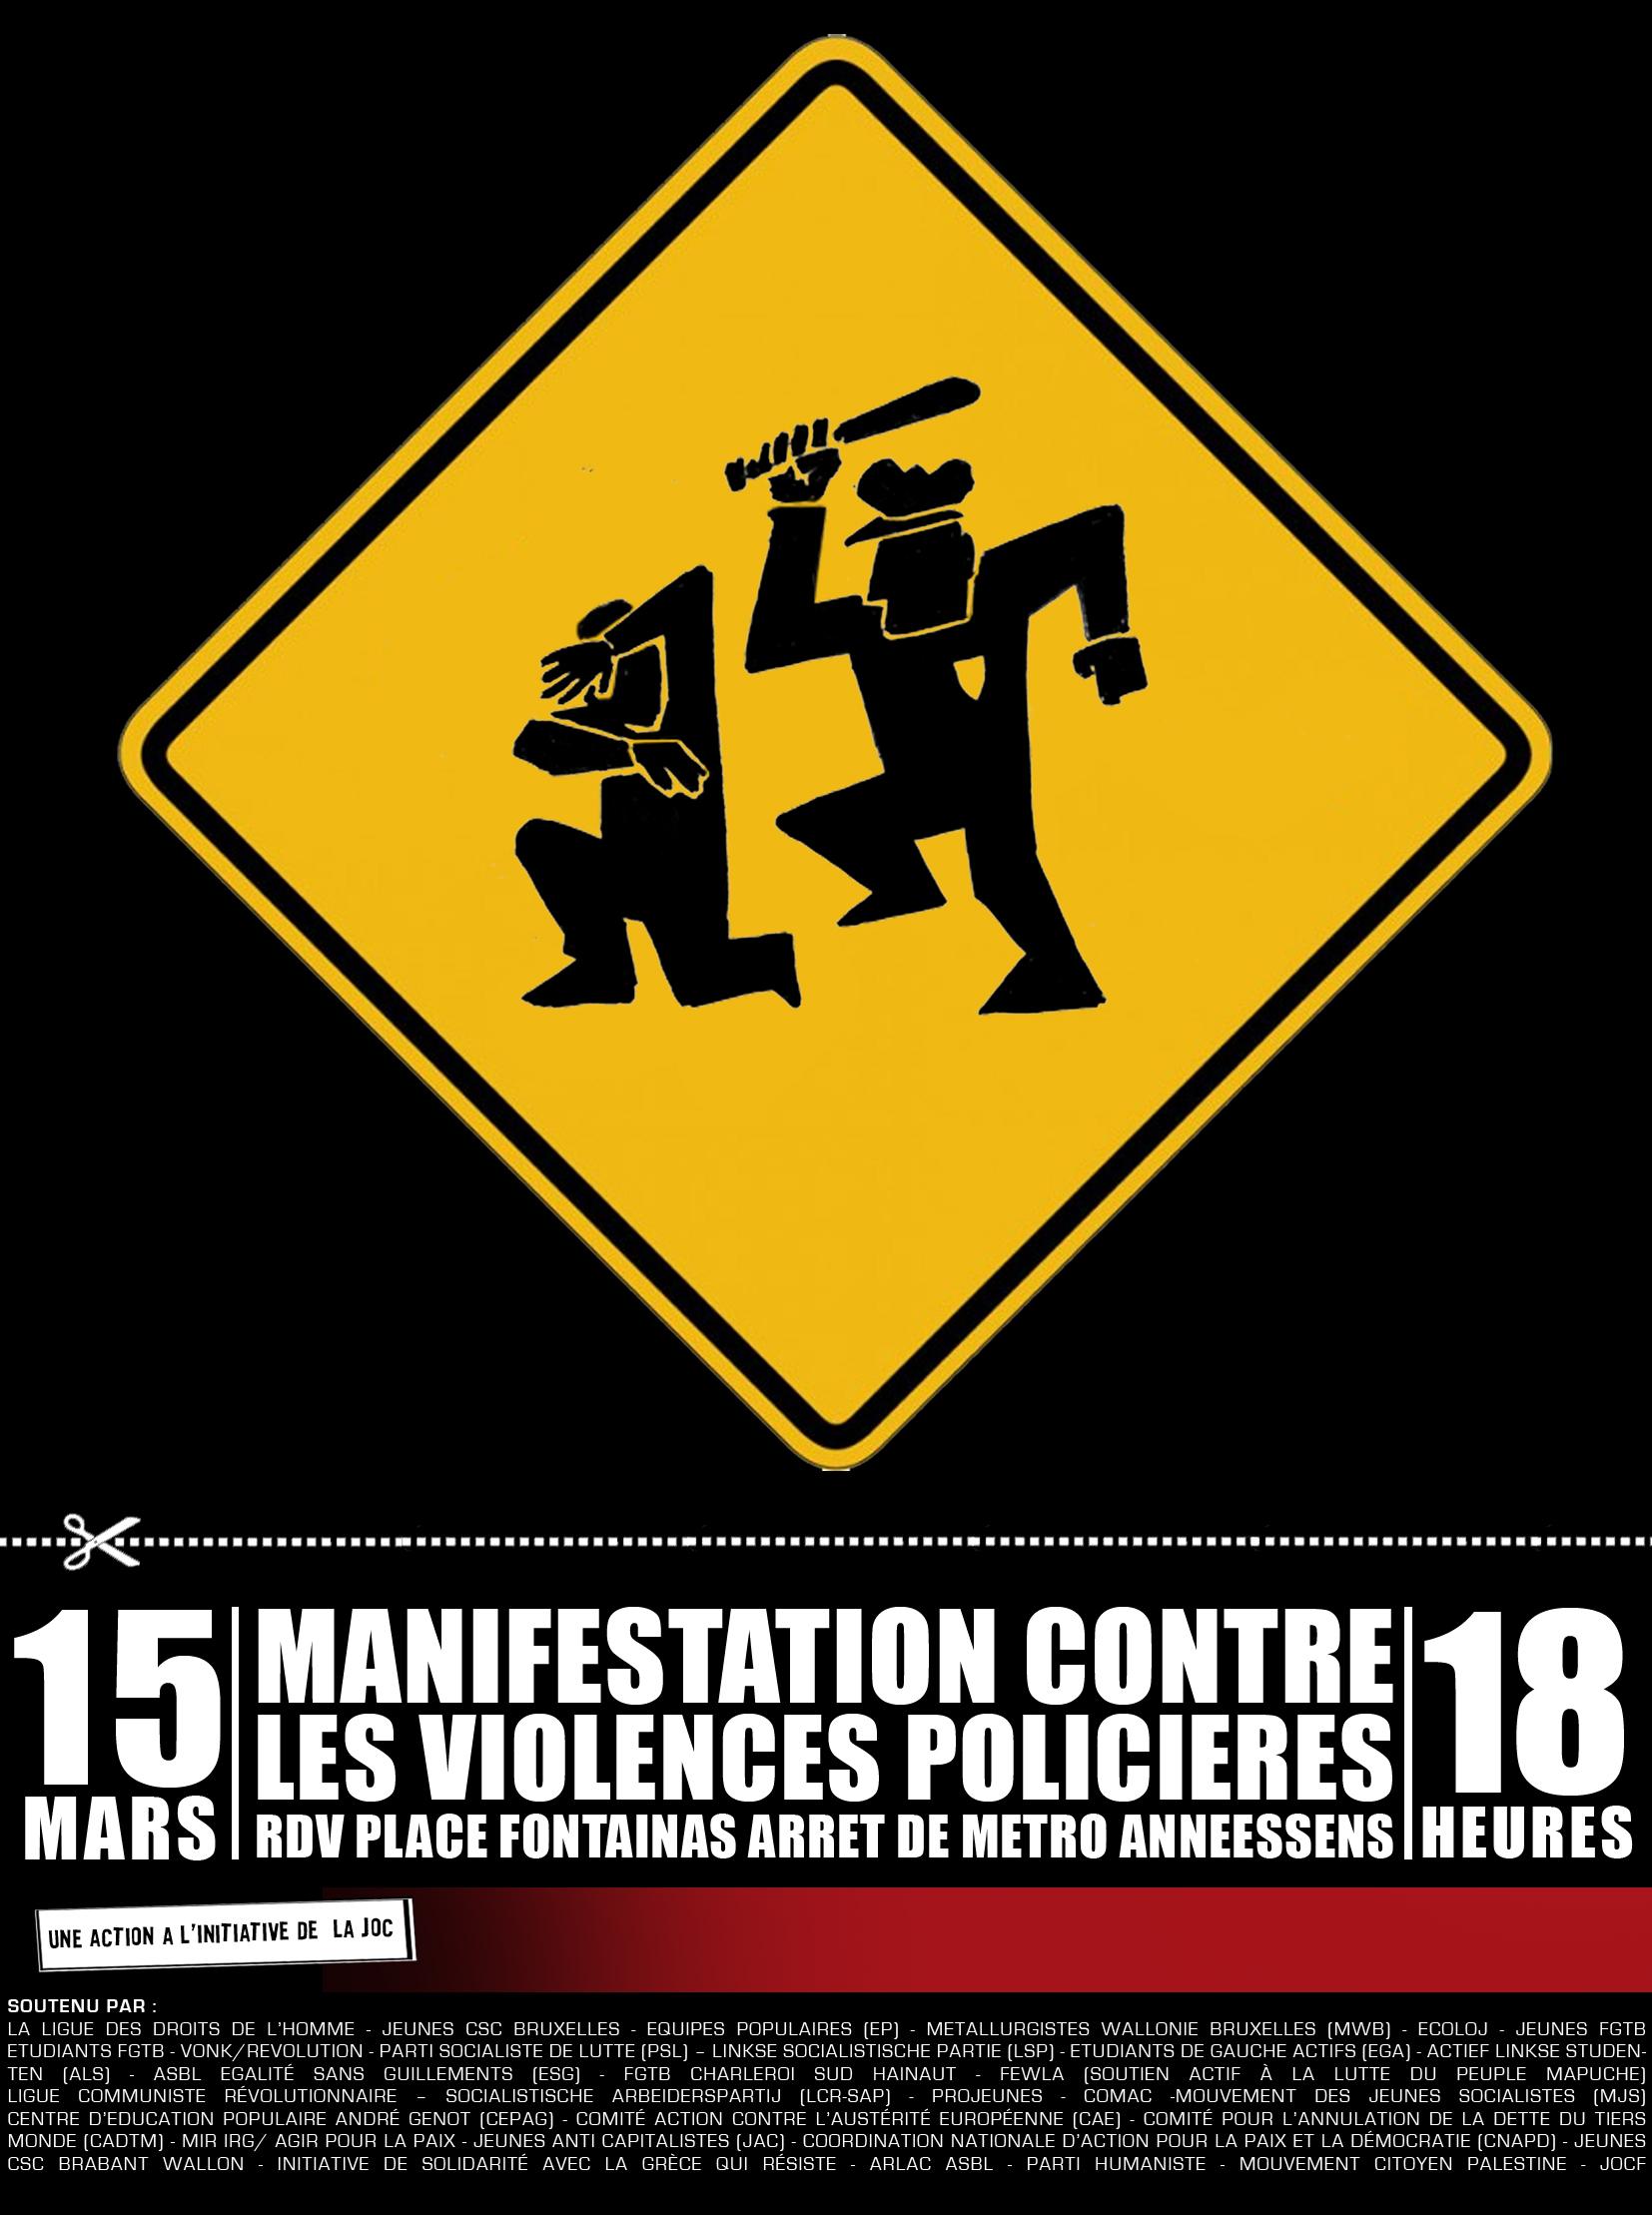 15 mars contre les violences policieres